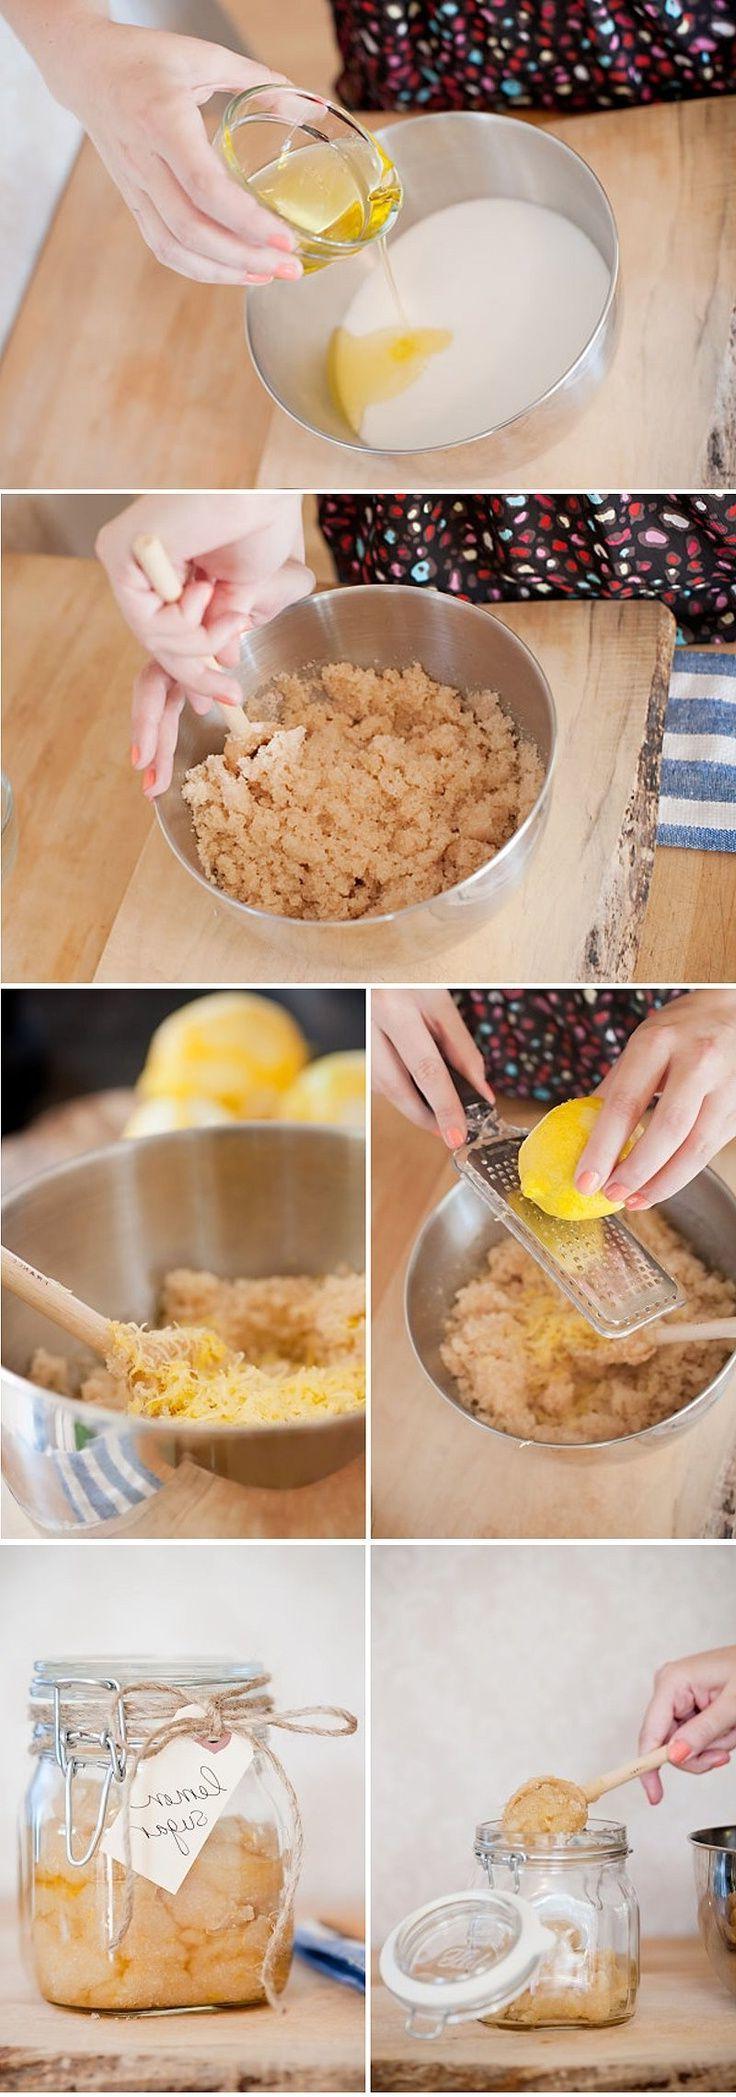 Peeling selber machen - Zitronen-Zucker Peeling Rezept